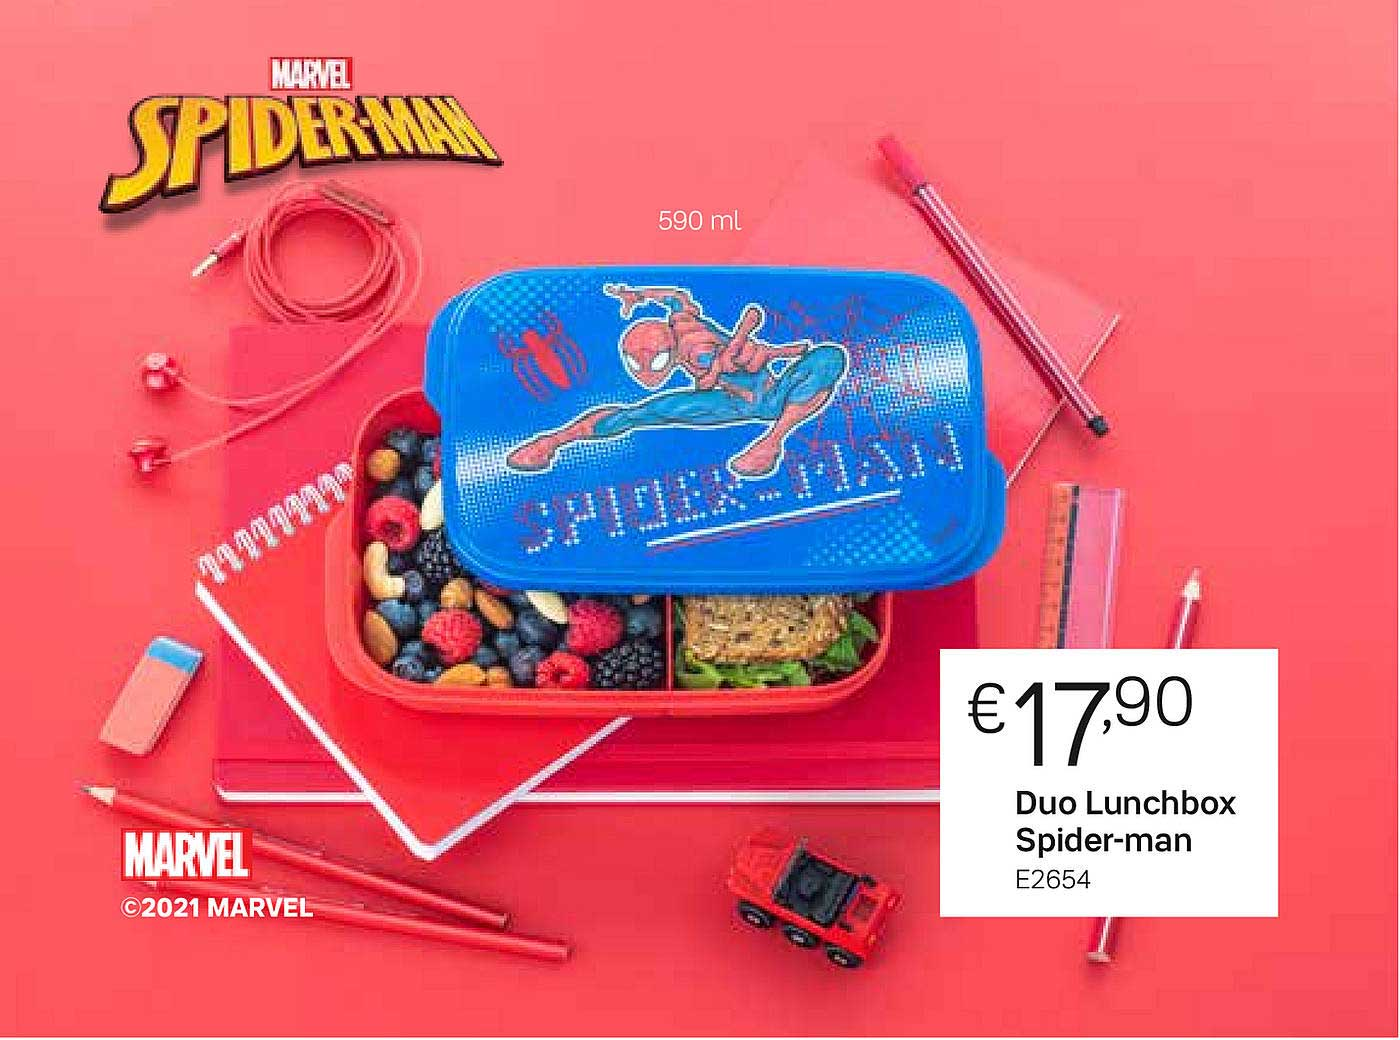 Tupperware Duo Lunchbox Spider-Man